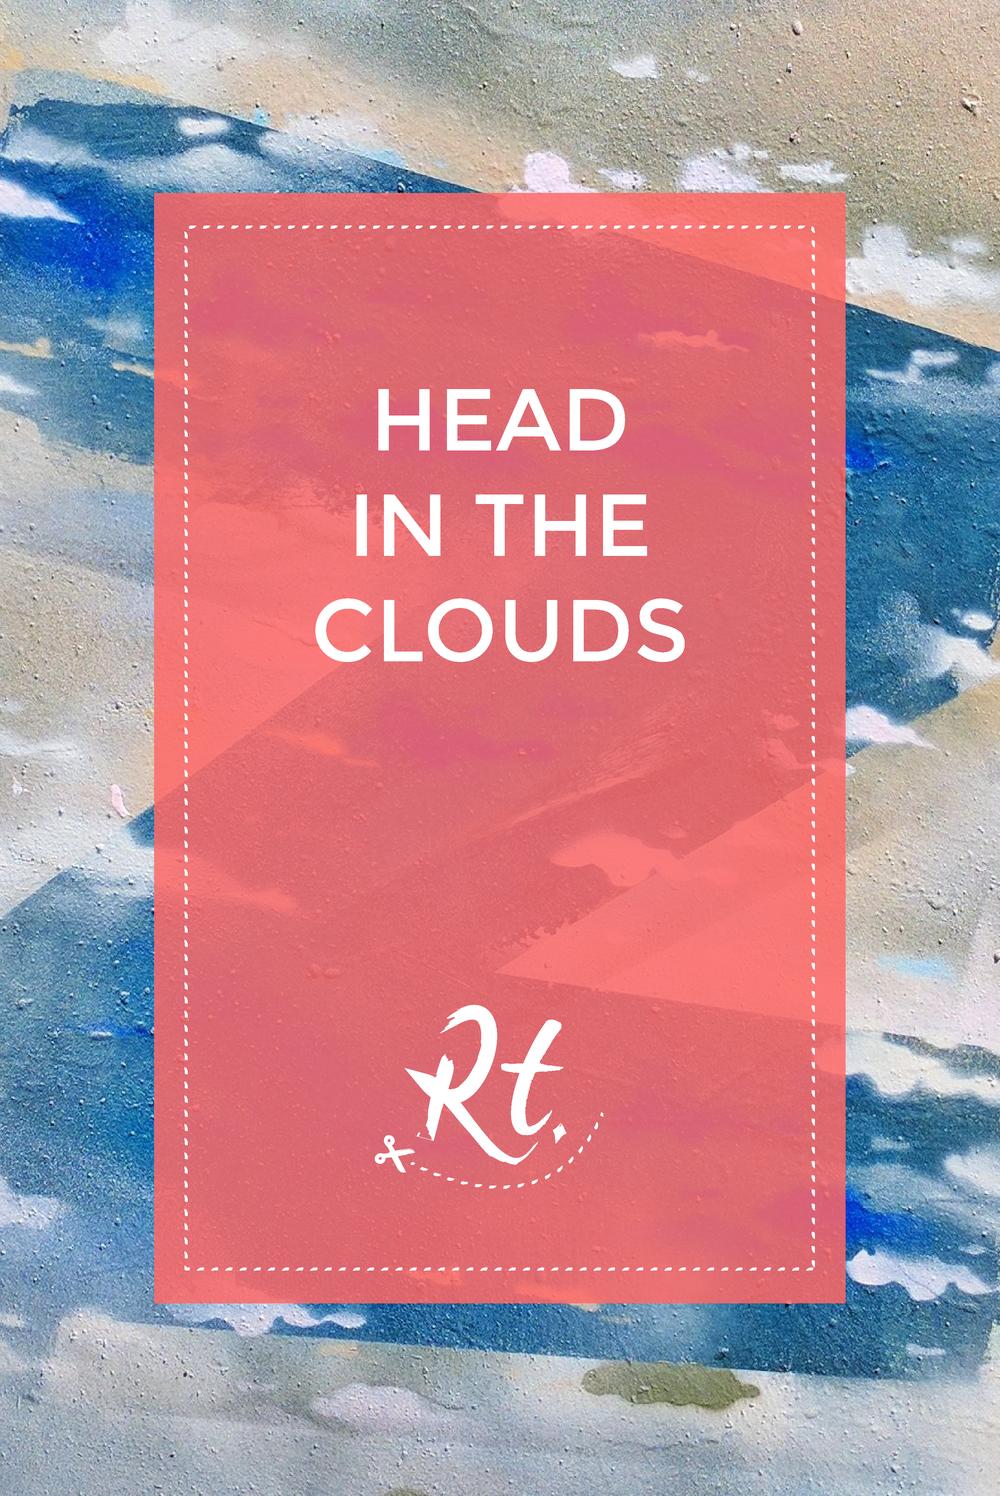 Head in the Clouds by Rosh Thanki, sleepy Zandism Z street art in Camden Town